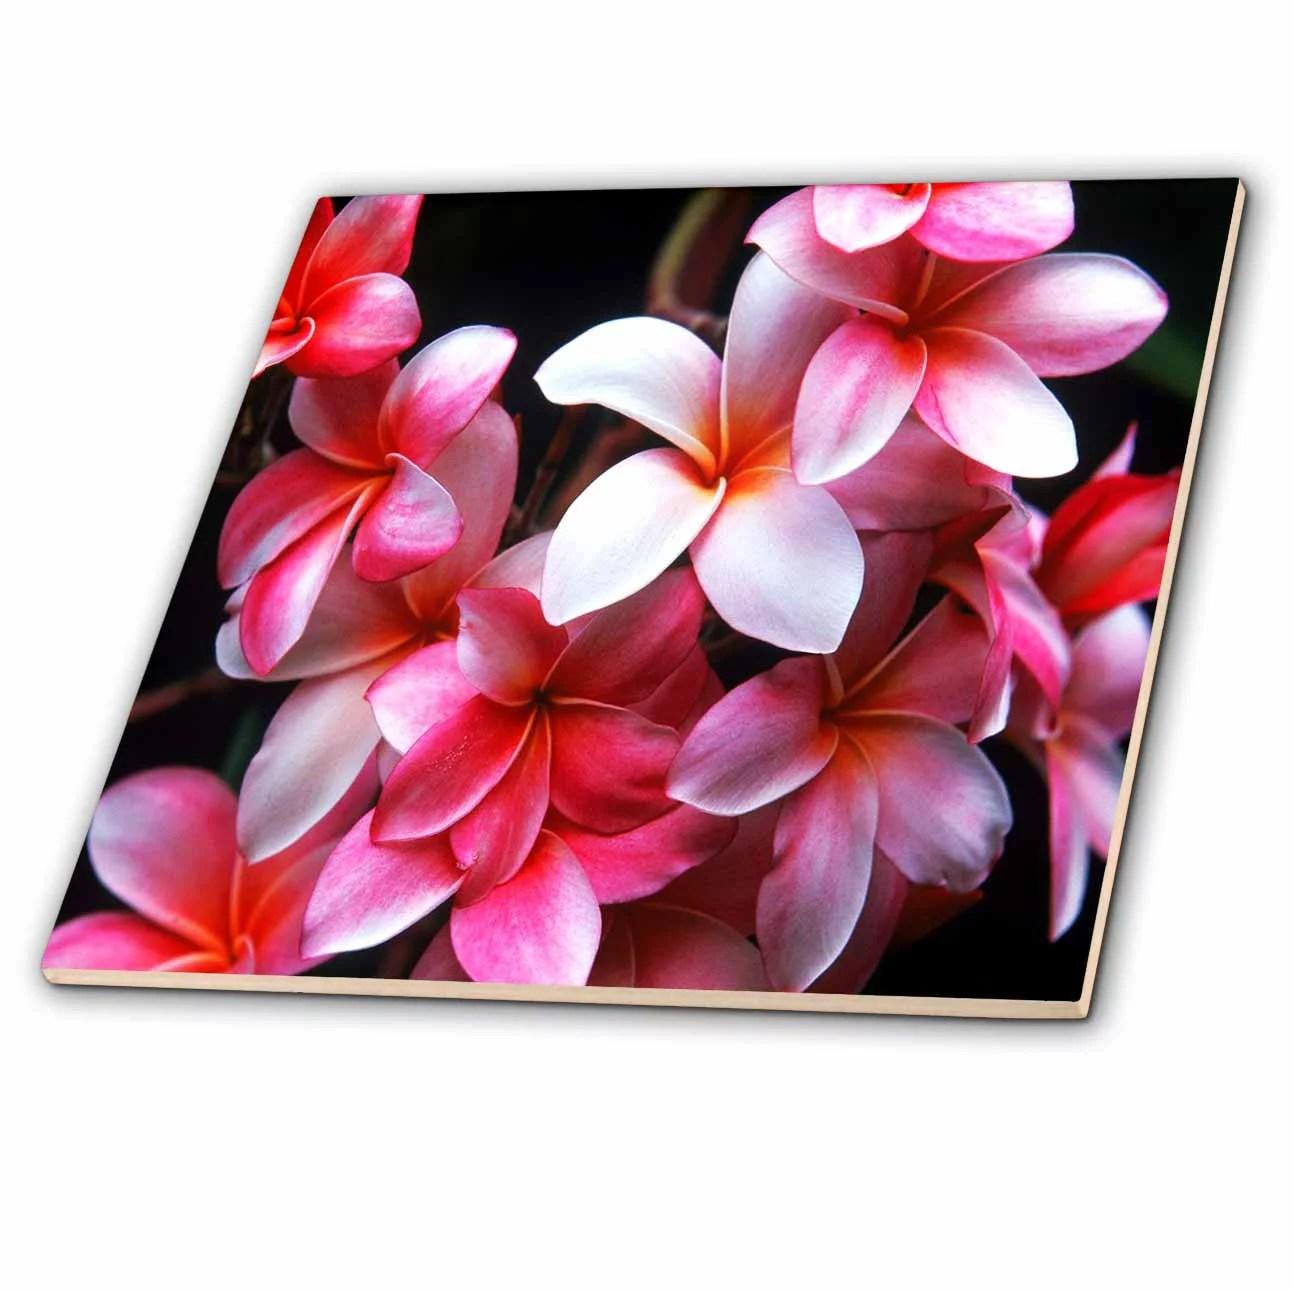 3drose hawaiian fuchsia colored plumeria flowers ceramic tile 6 inch